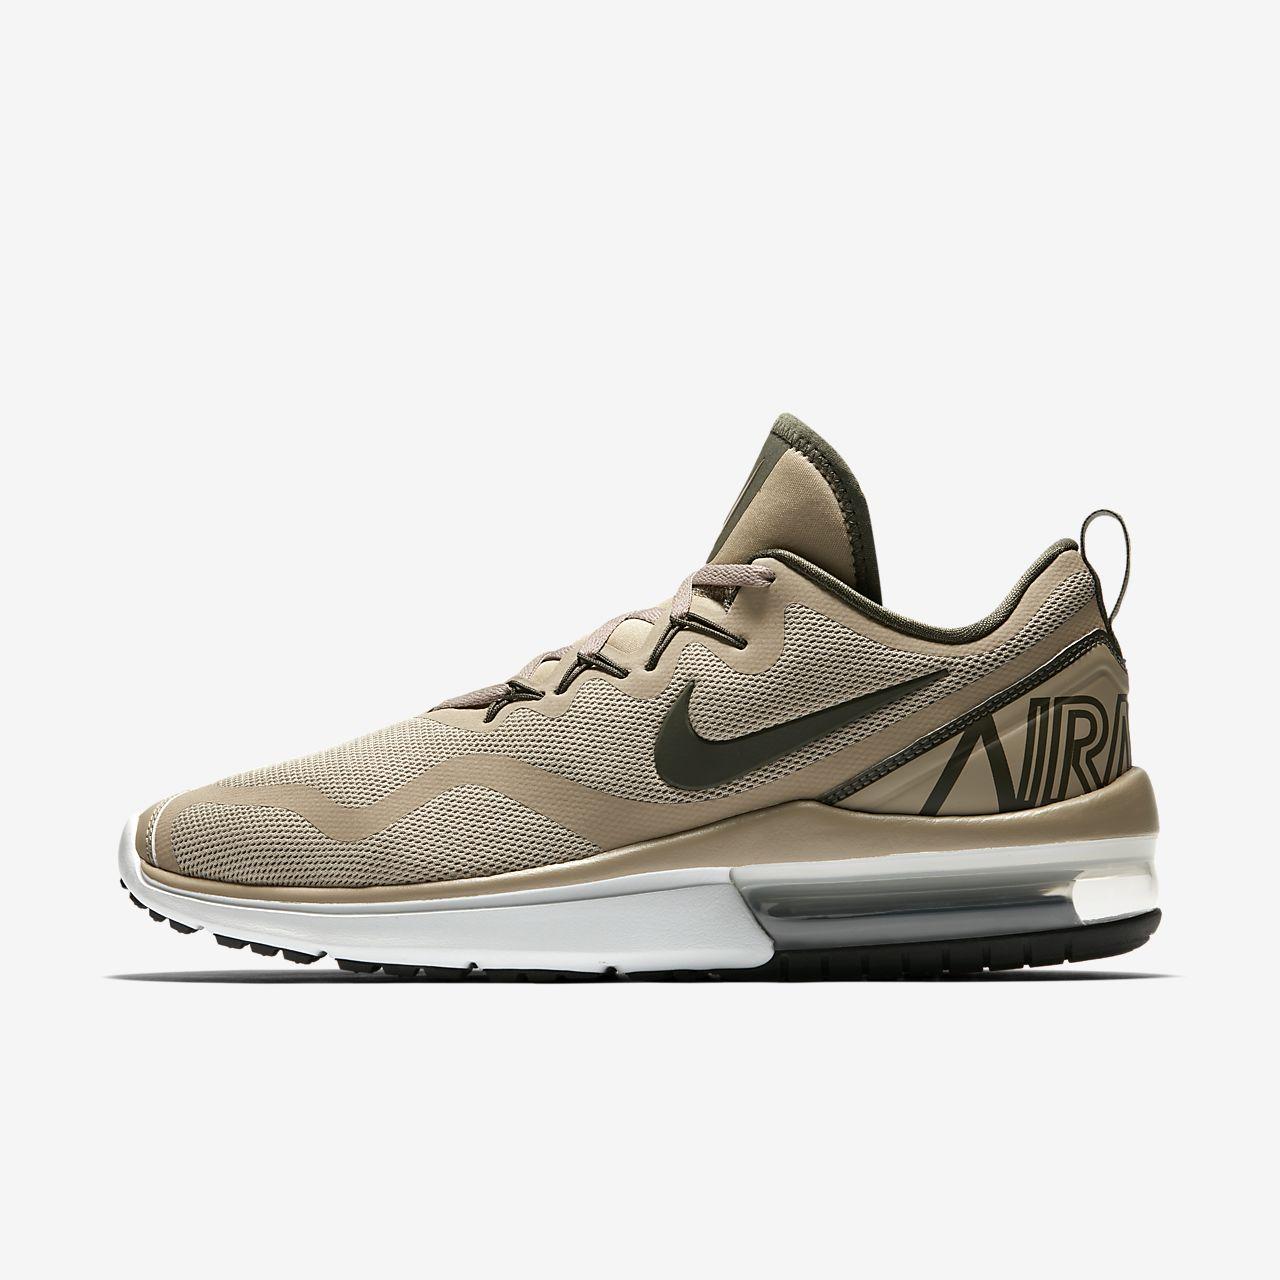 Nike Air Max Max Max Fury Uomo In esecuzione scarpe. Nike  LU 9ce134